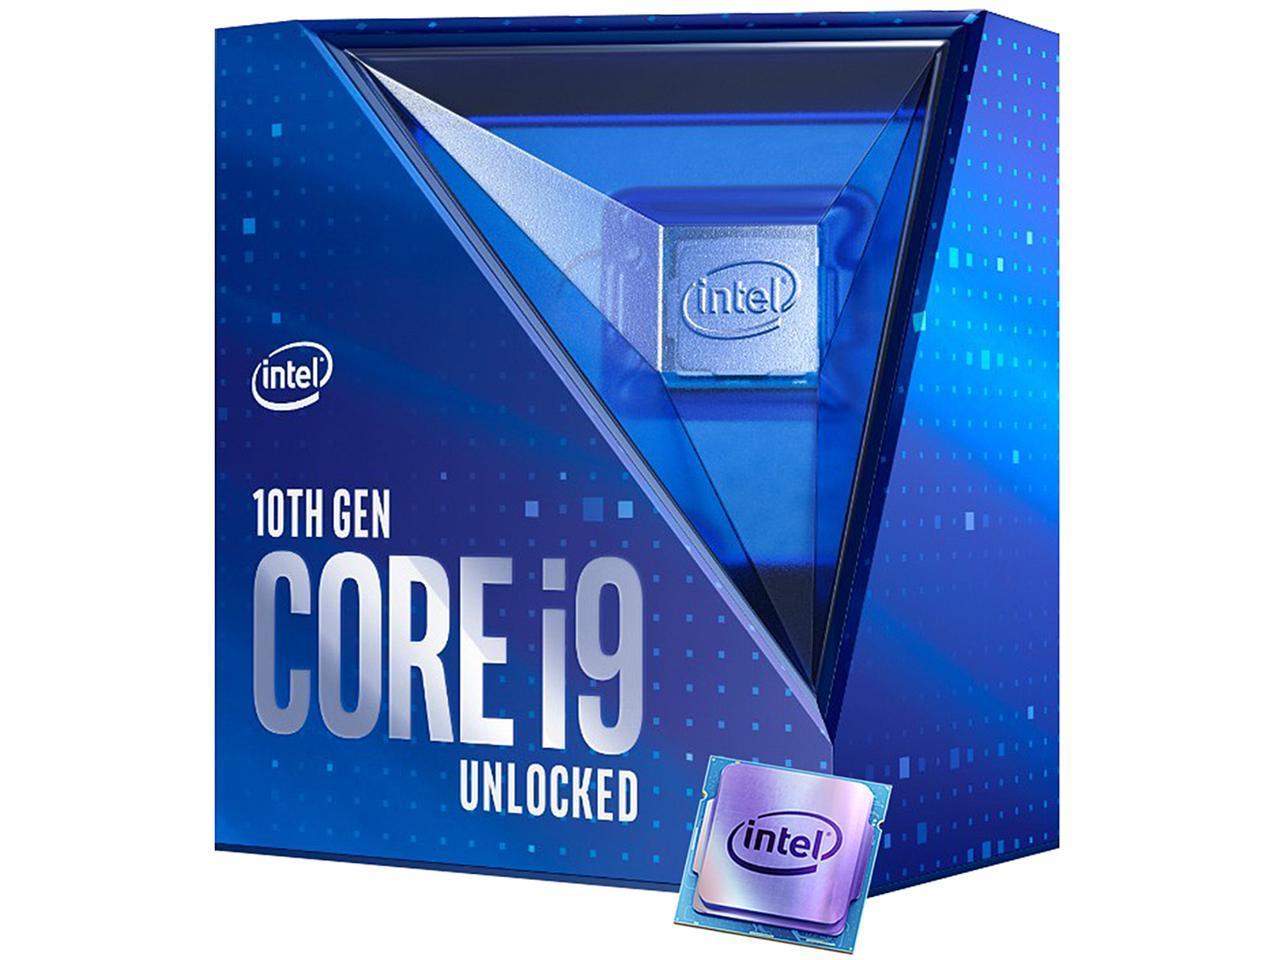 Intel Core i9-10900K 10-Core 3.7 GHz LGA 1200 125W BX8070110900K 10th Gen Comet Lake Desktop Processor Intel UHD Graphics 630